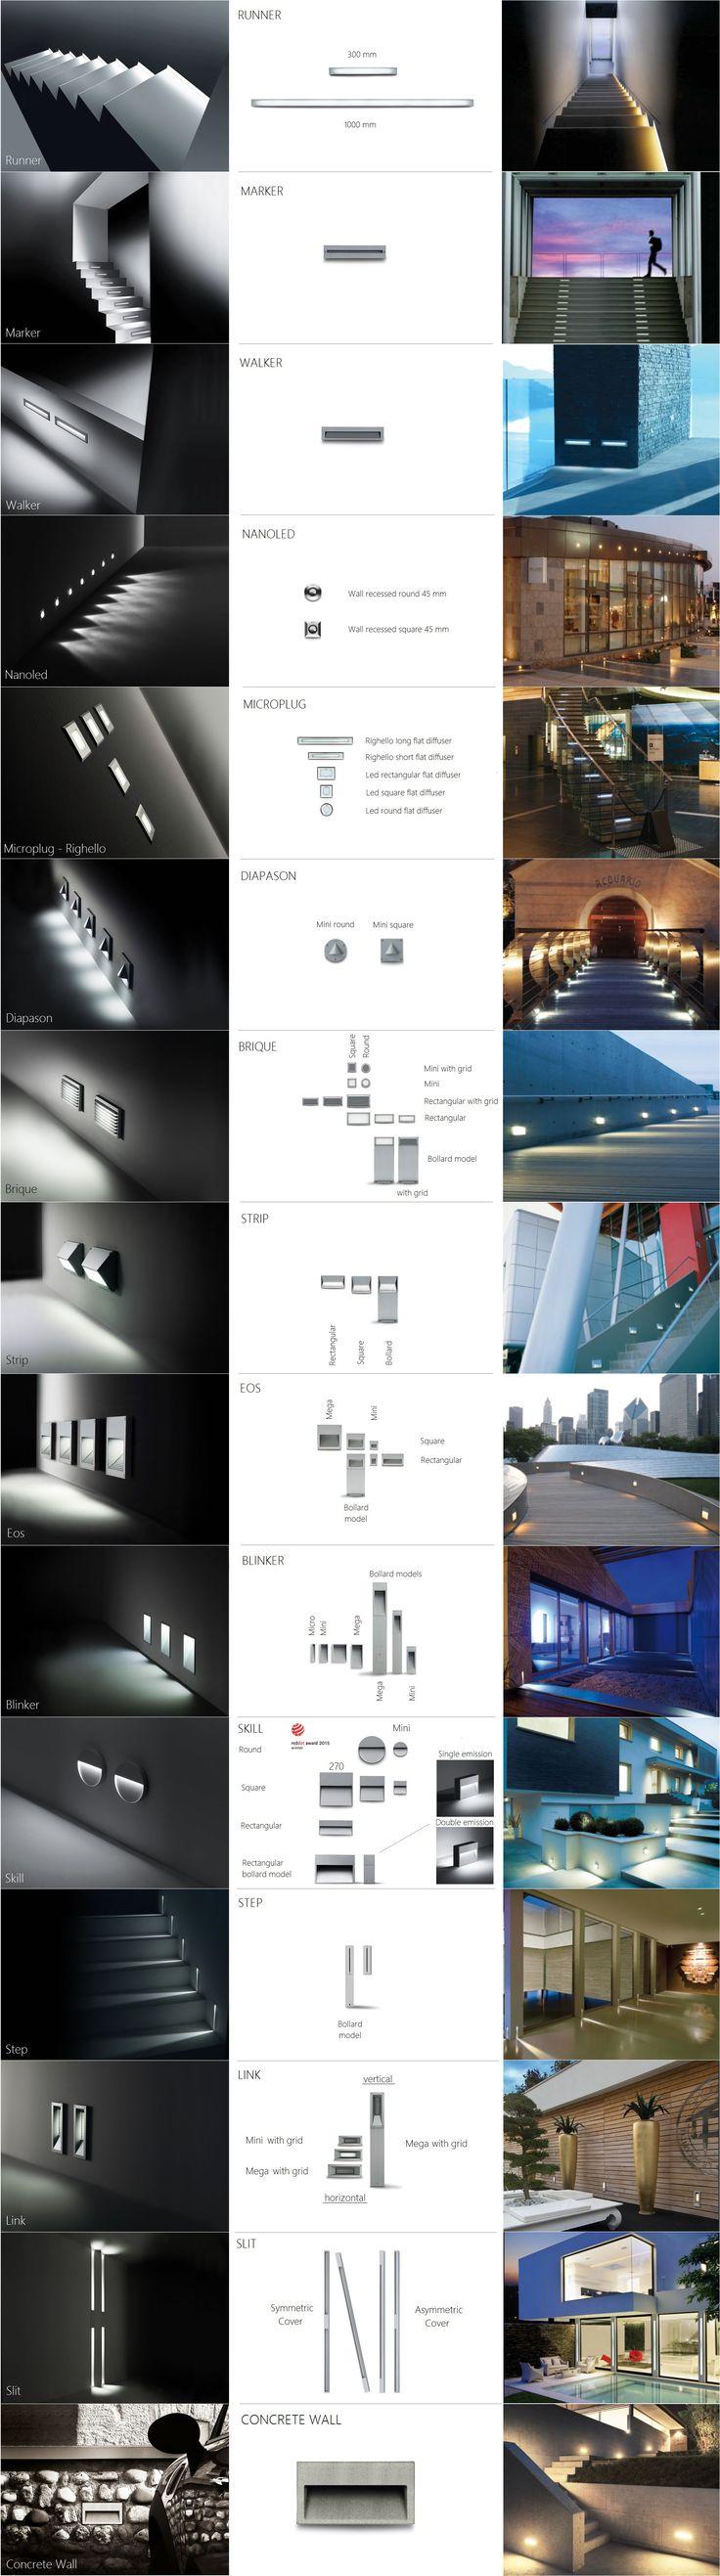 45244d041b243d3cdc3edd91b7a64818--material-board-interior-lighting Wunderbar Led Lampen E14 Warmweiß Dekorationen